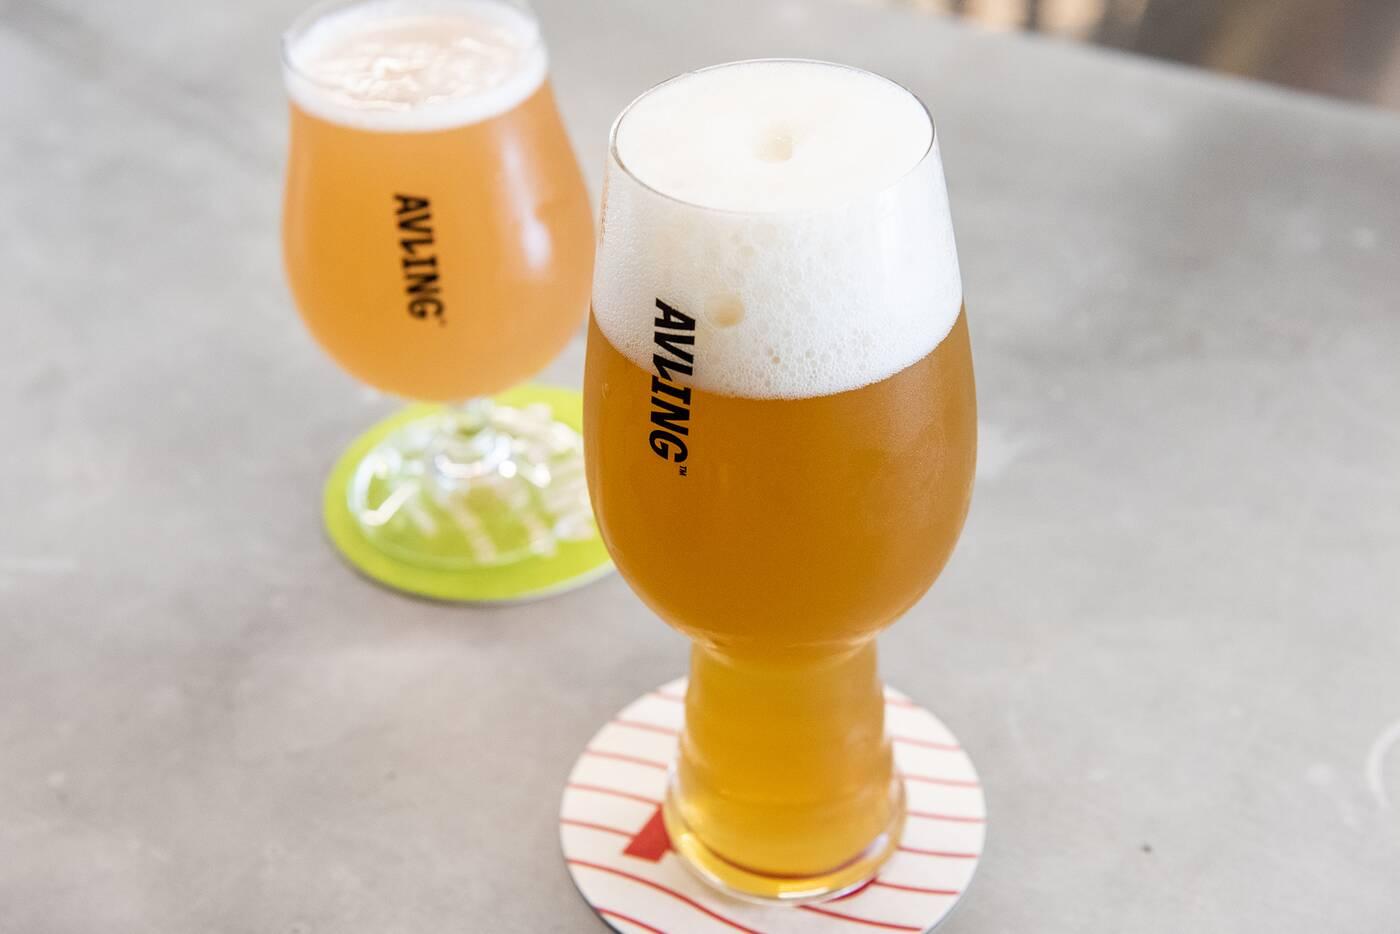 Avling Brewery Toronto